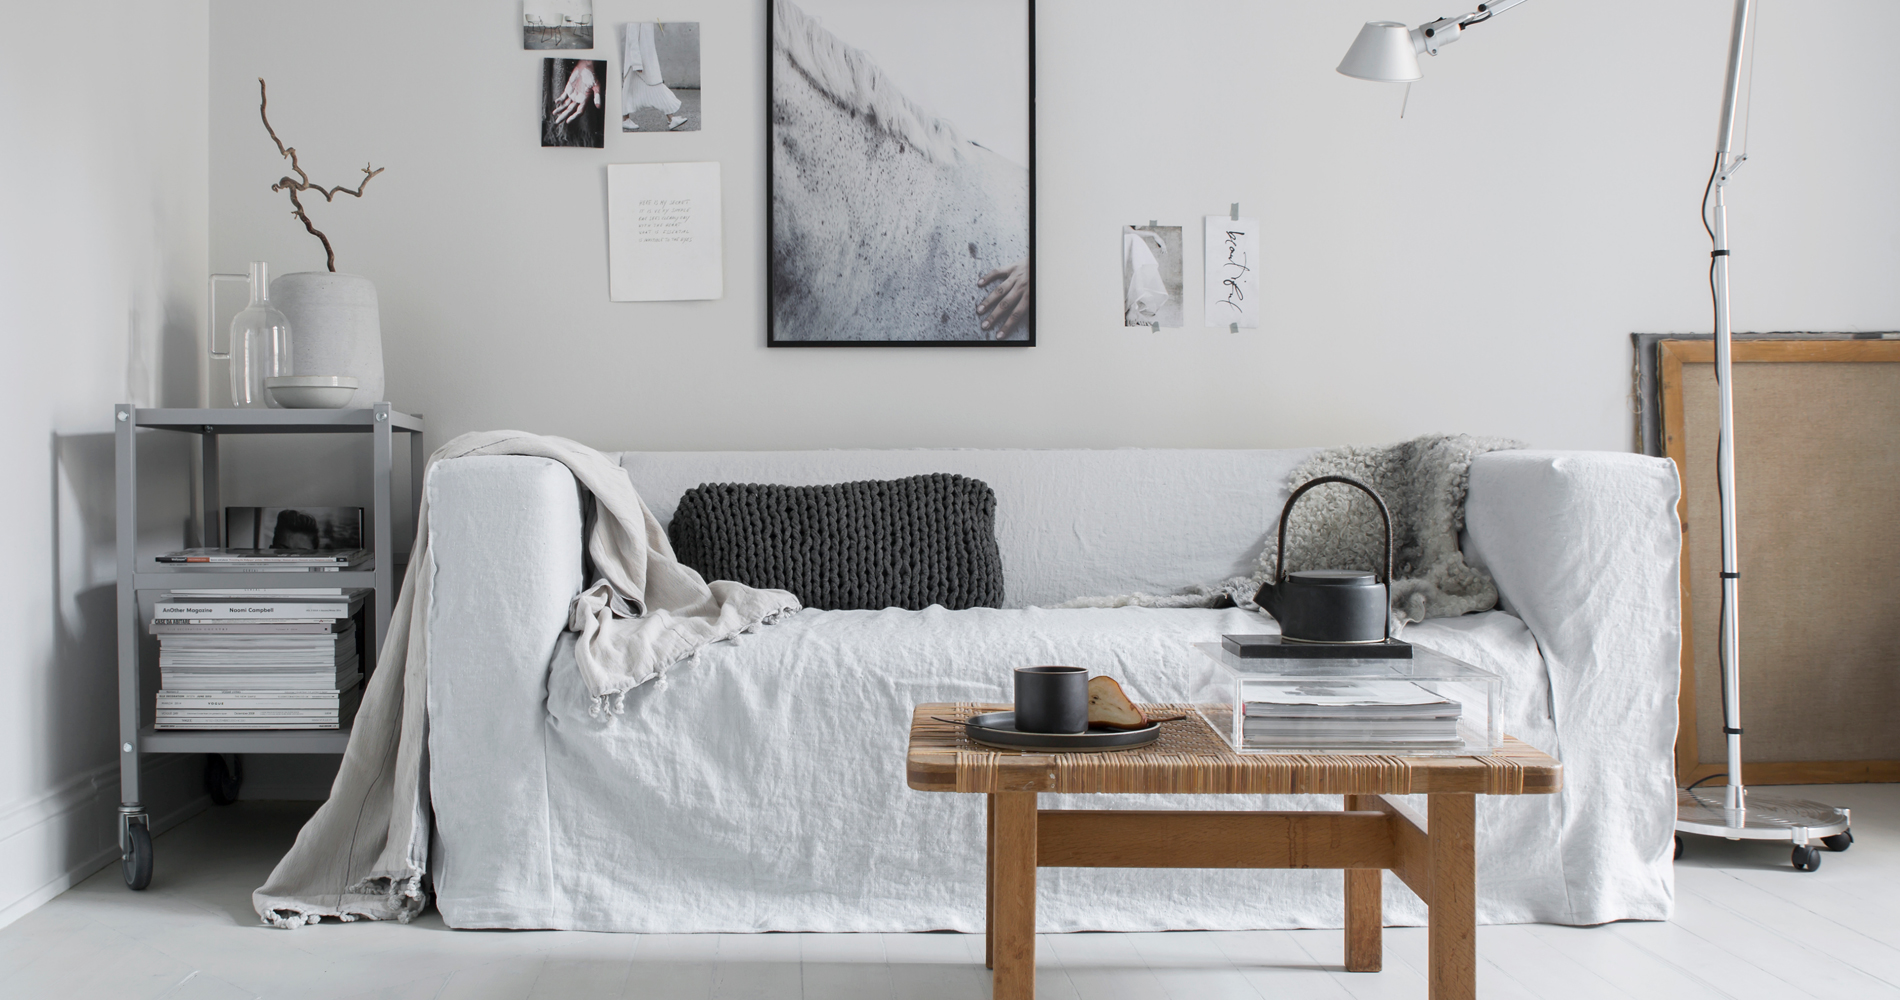 Recouvrir Porte De Cuisine dix conseils pour customiser ses meubles ikea - madame figaro